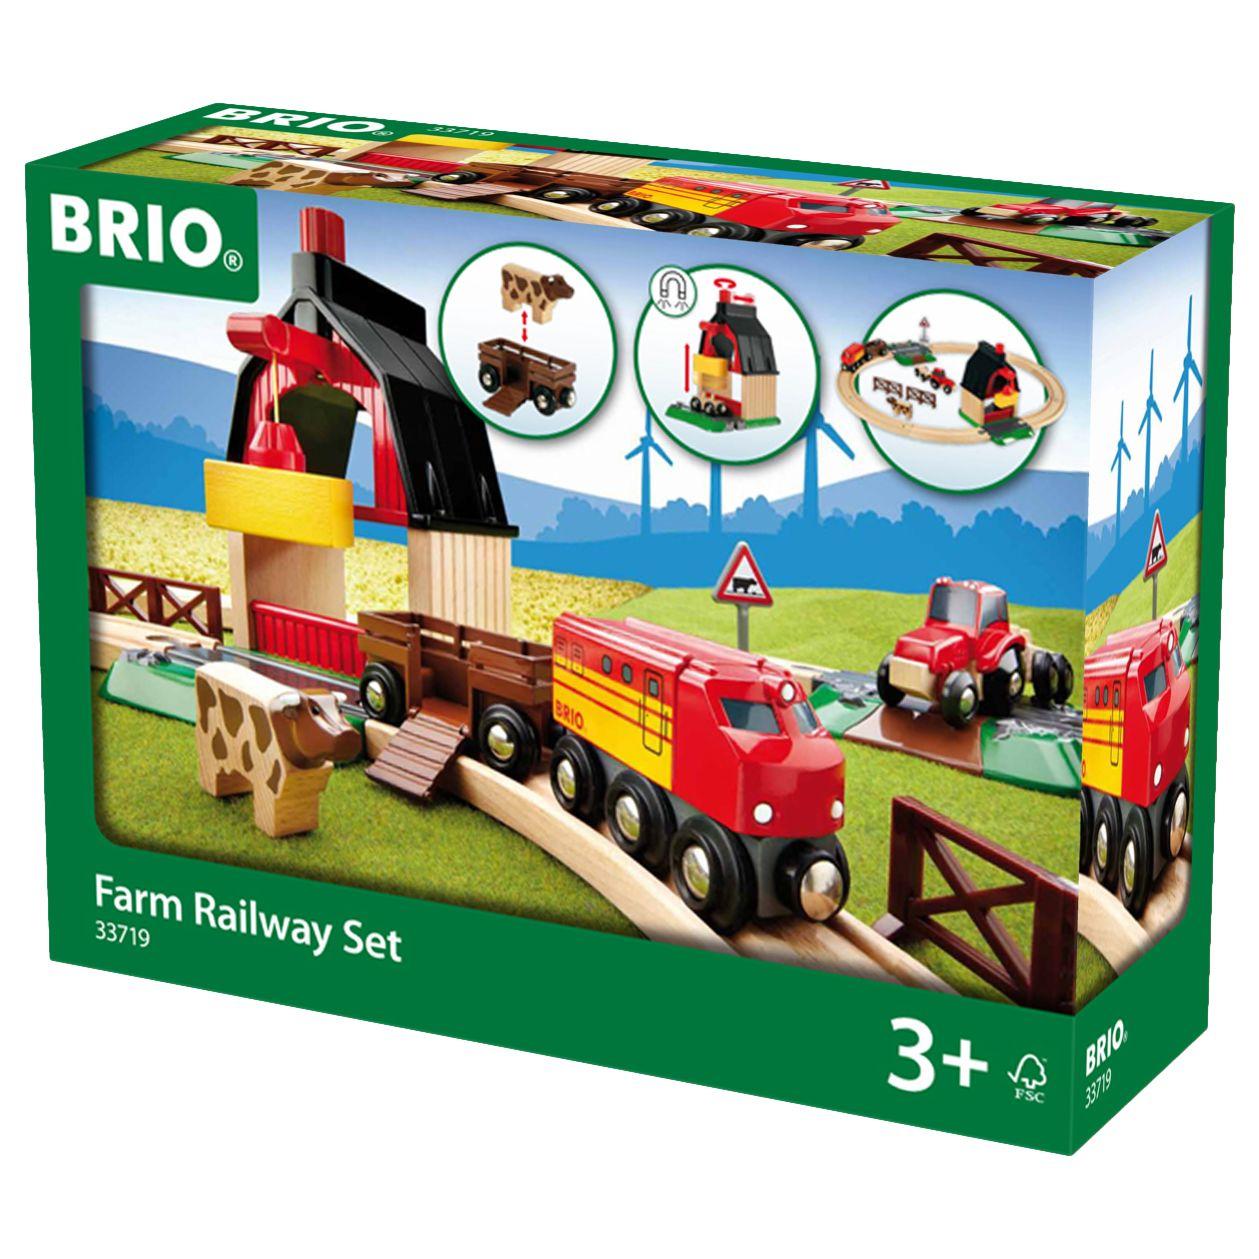 BRIO BRIO World Farm Railway Set